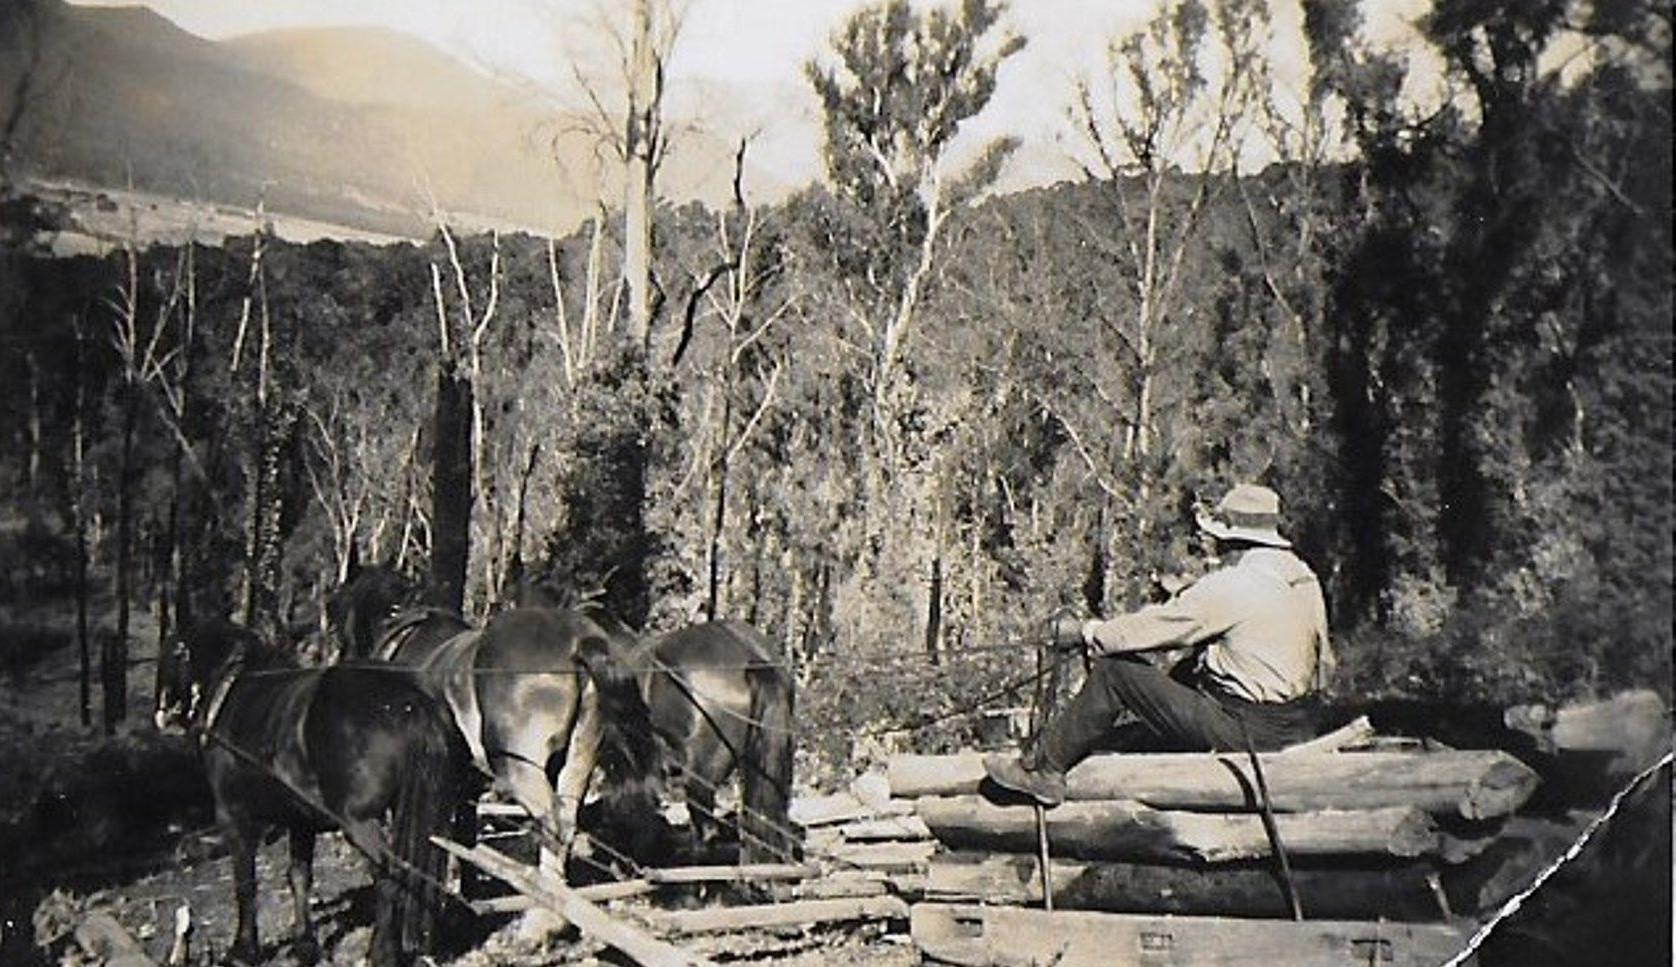 John-Baker-hauling-logs